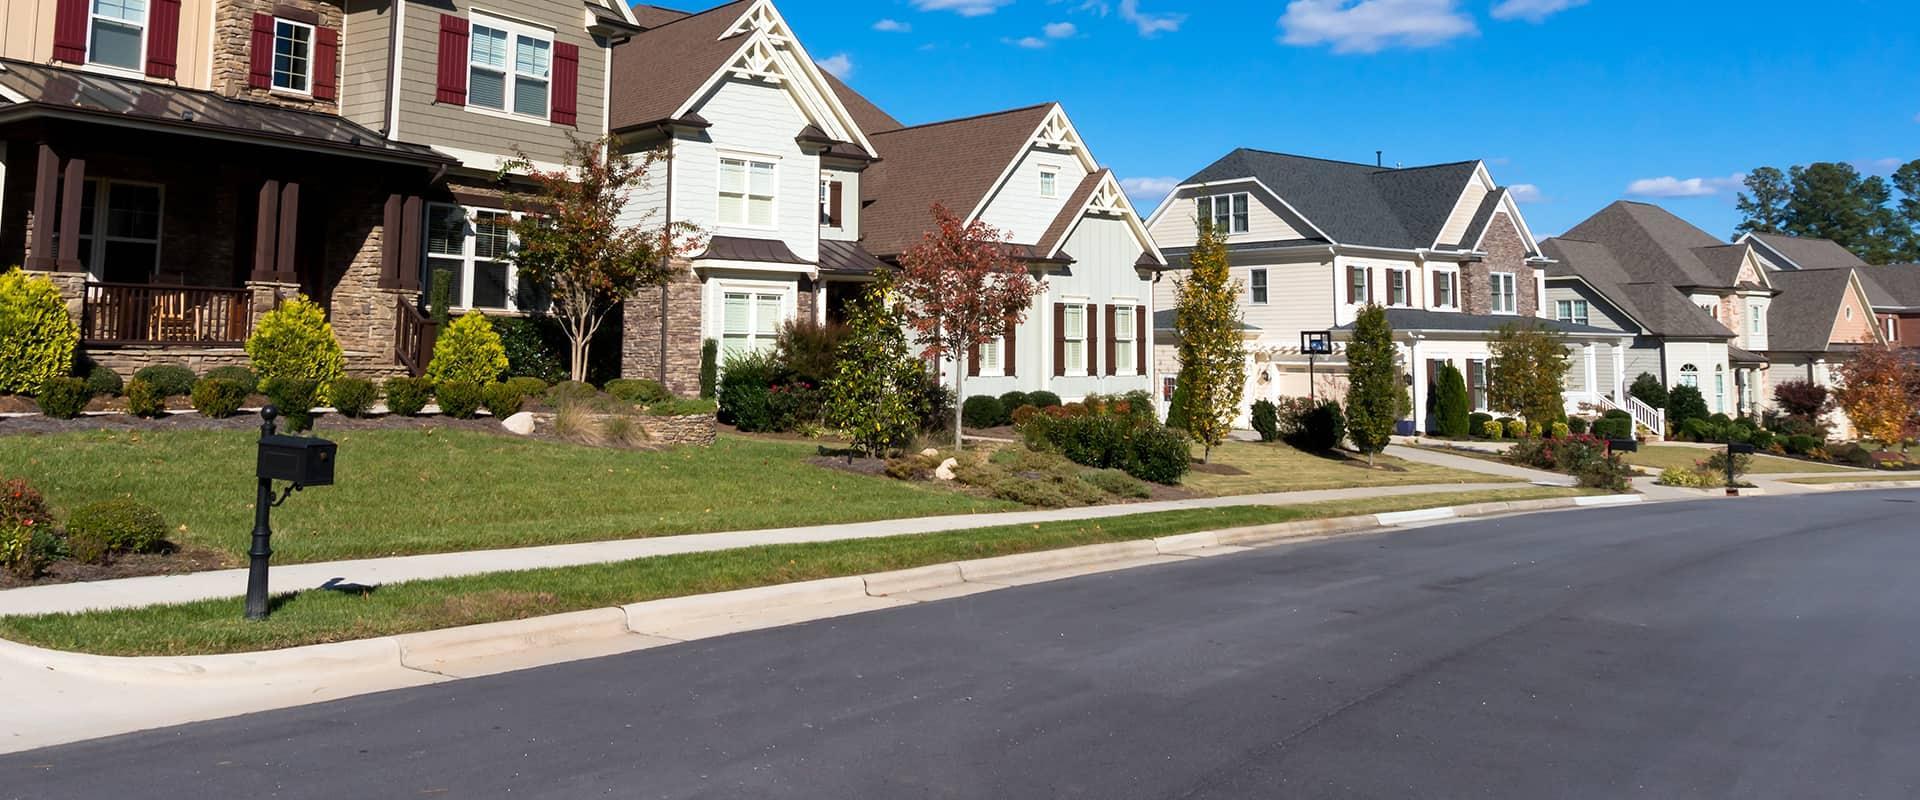 street view of a row of houses in philadelphia pennsylvania